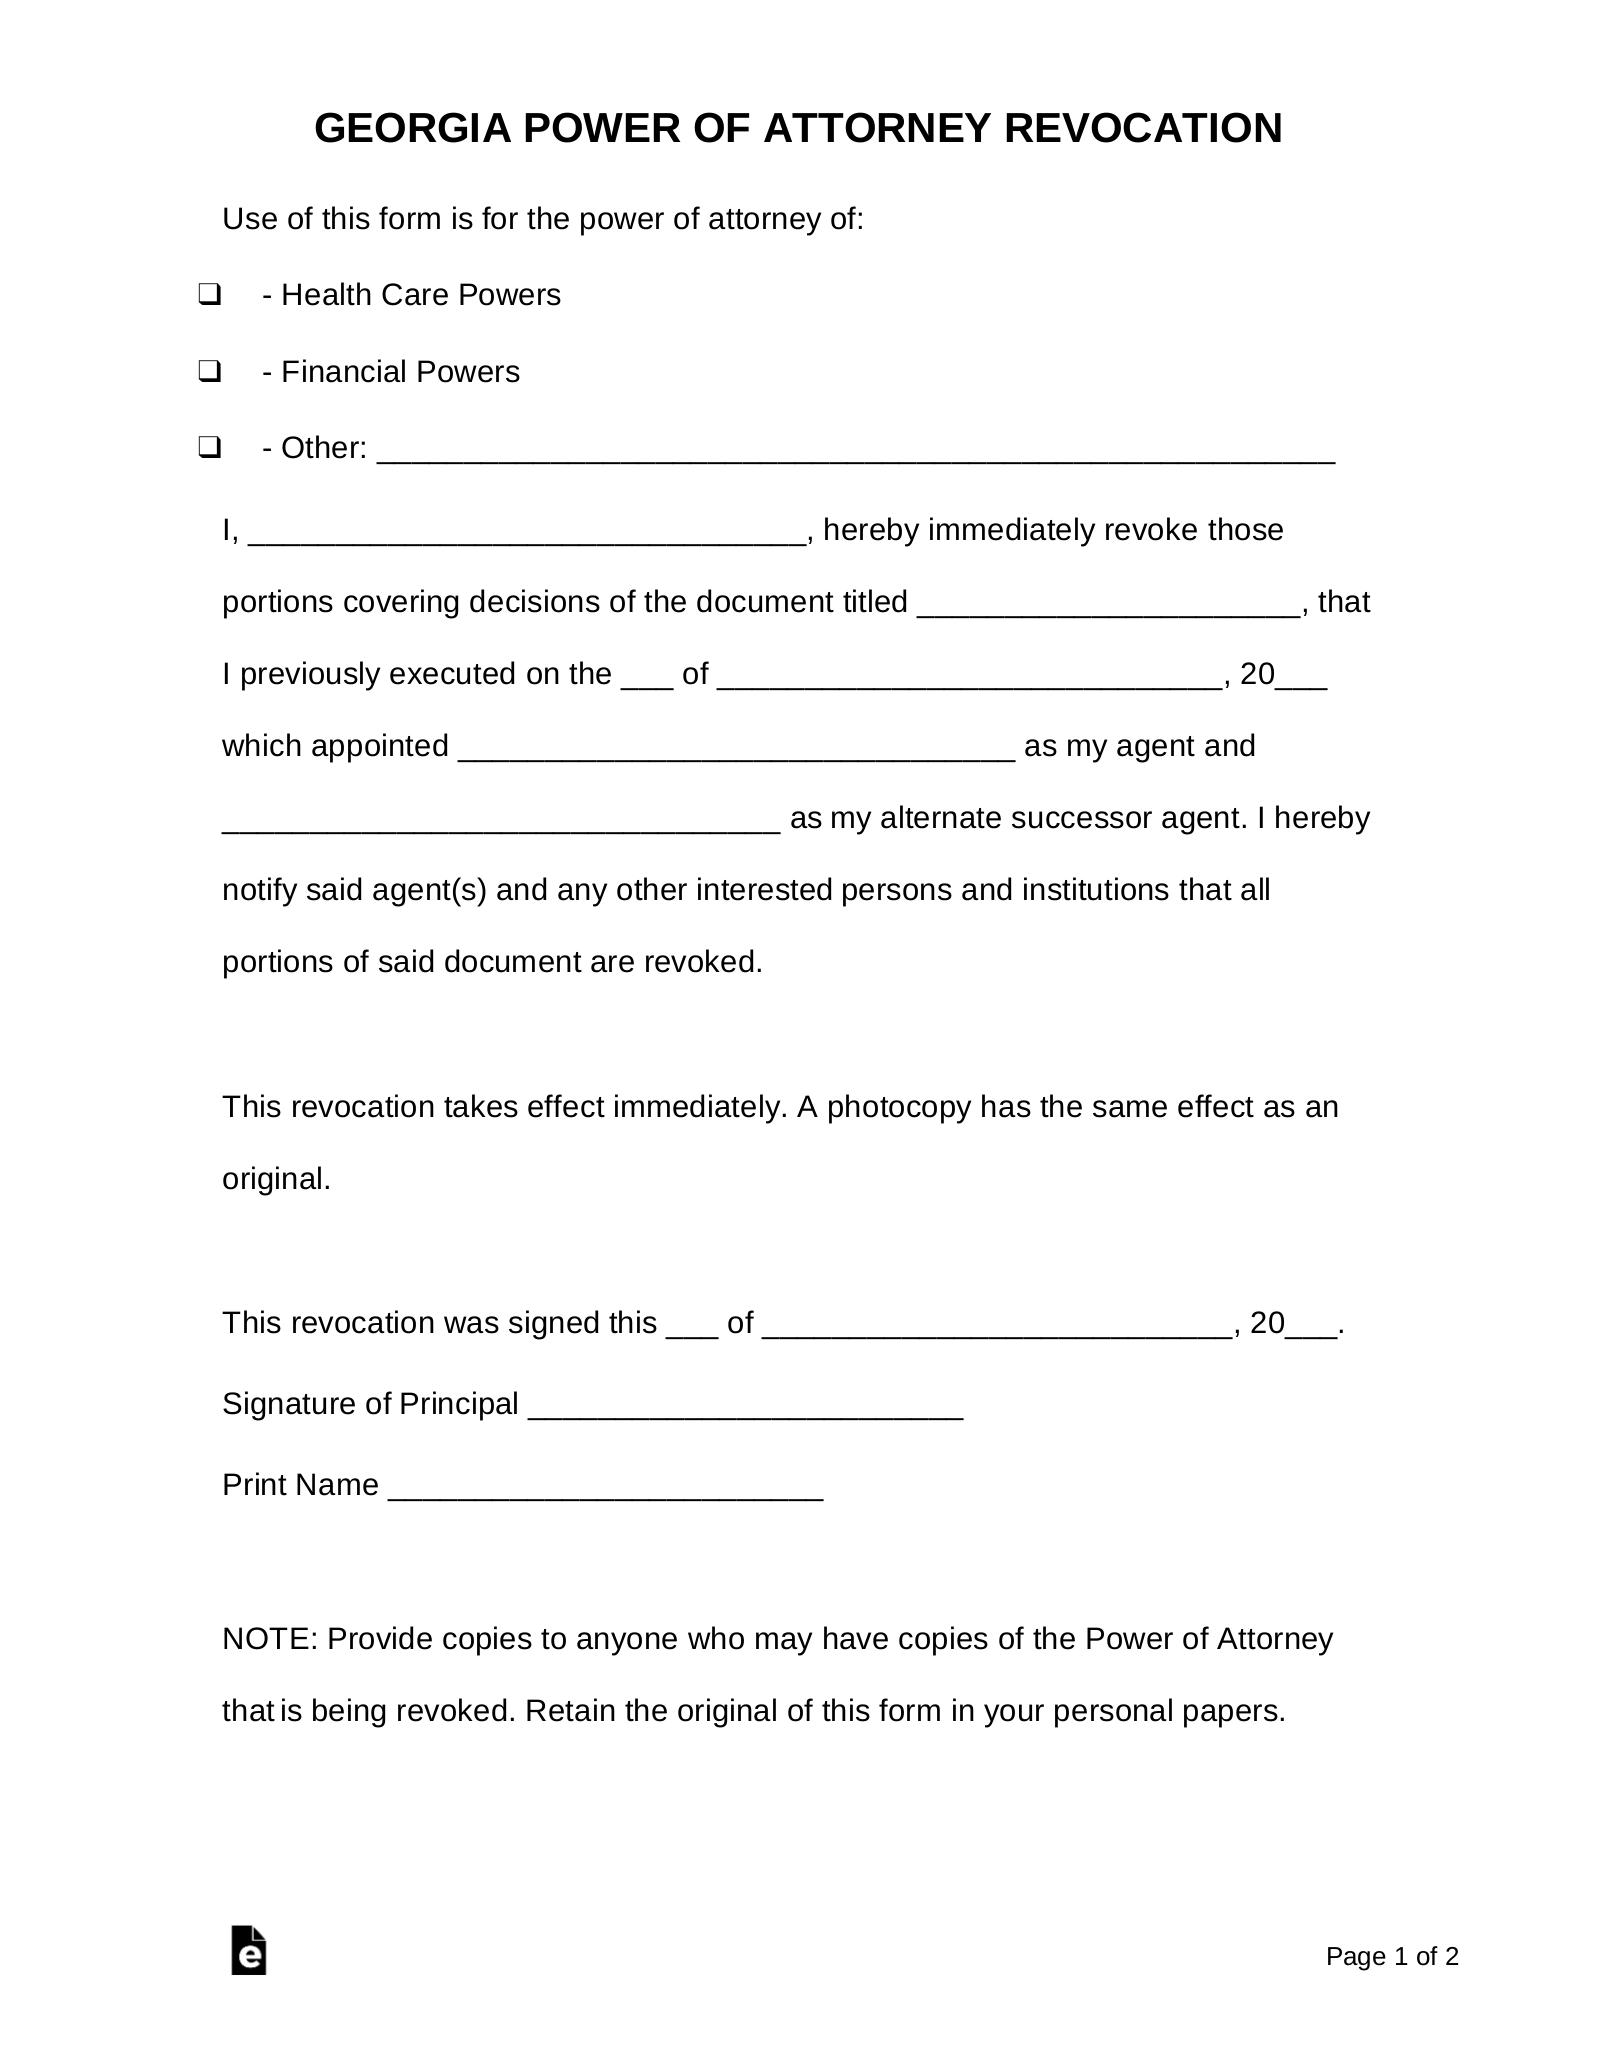 power of attorney form ga  Free Georgia Revocation Power of Attorney Form - PDF | Word ...